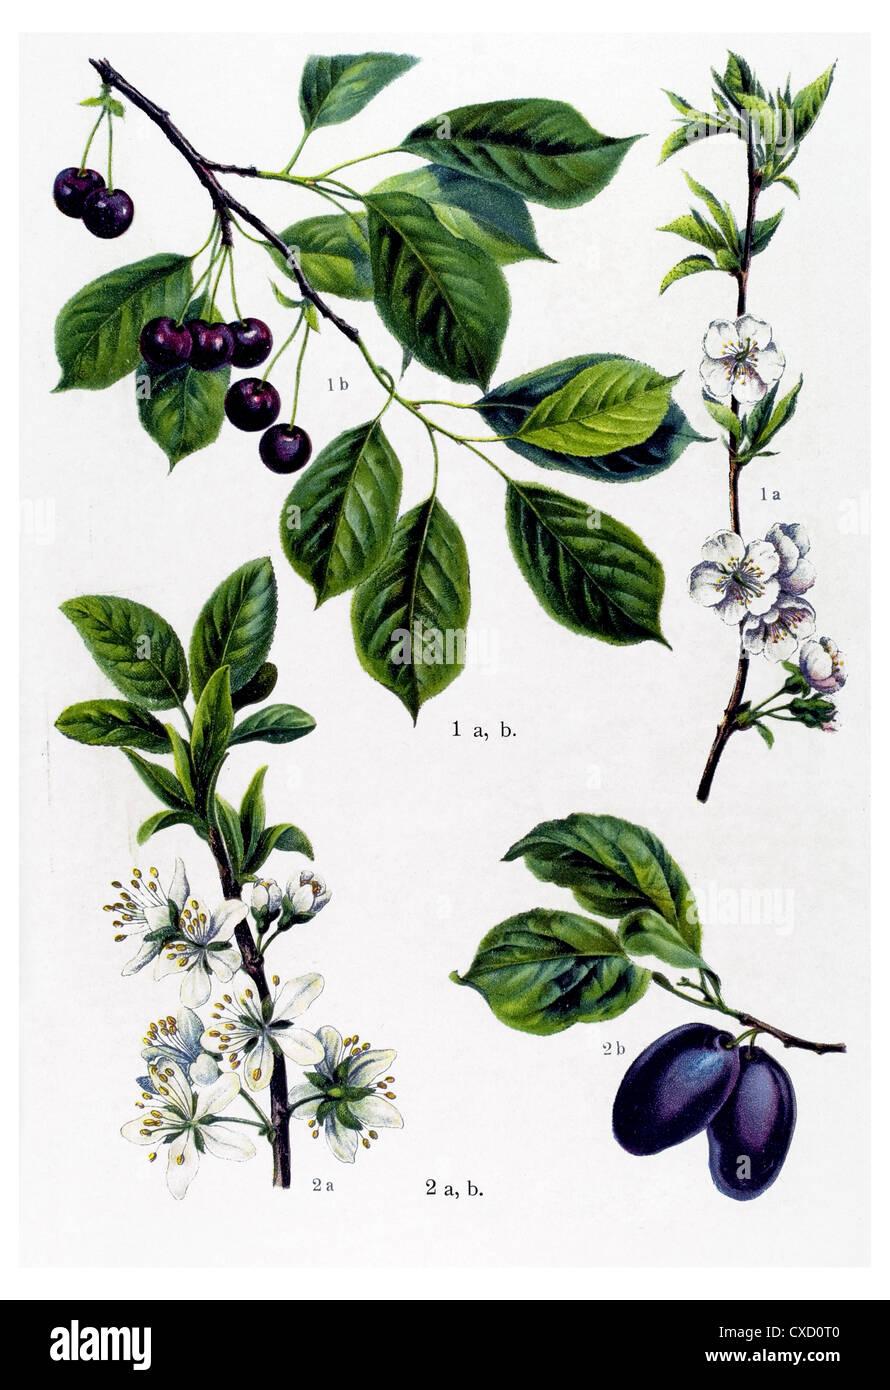 Prunus cerasus - Stock Image